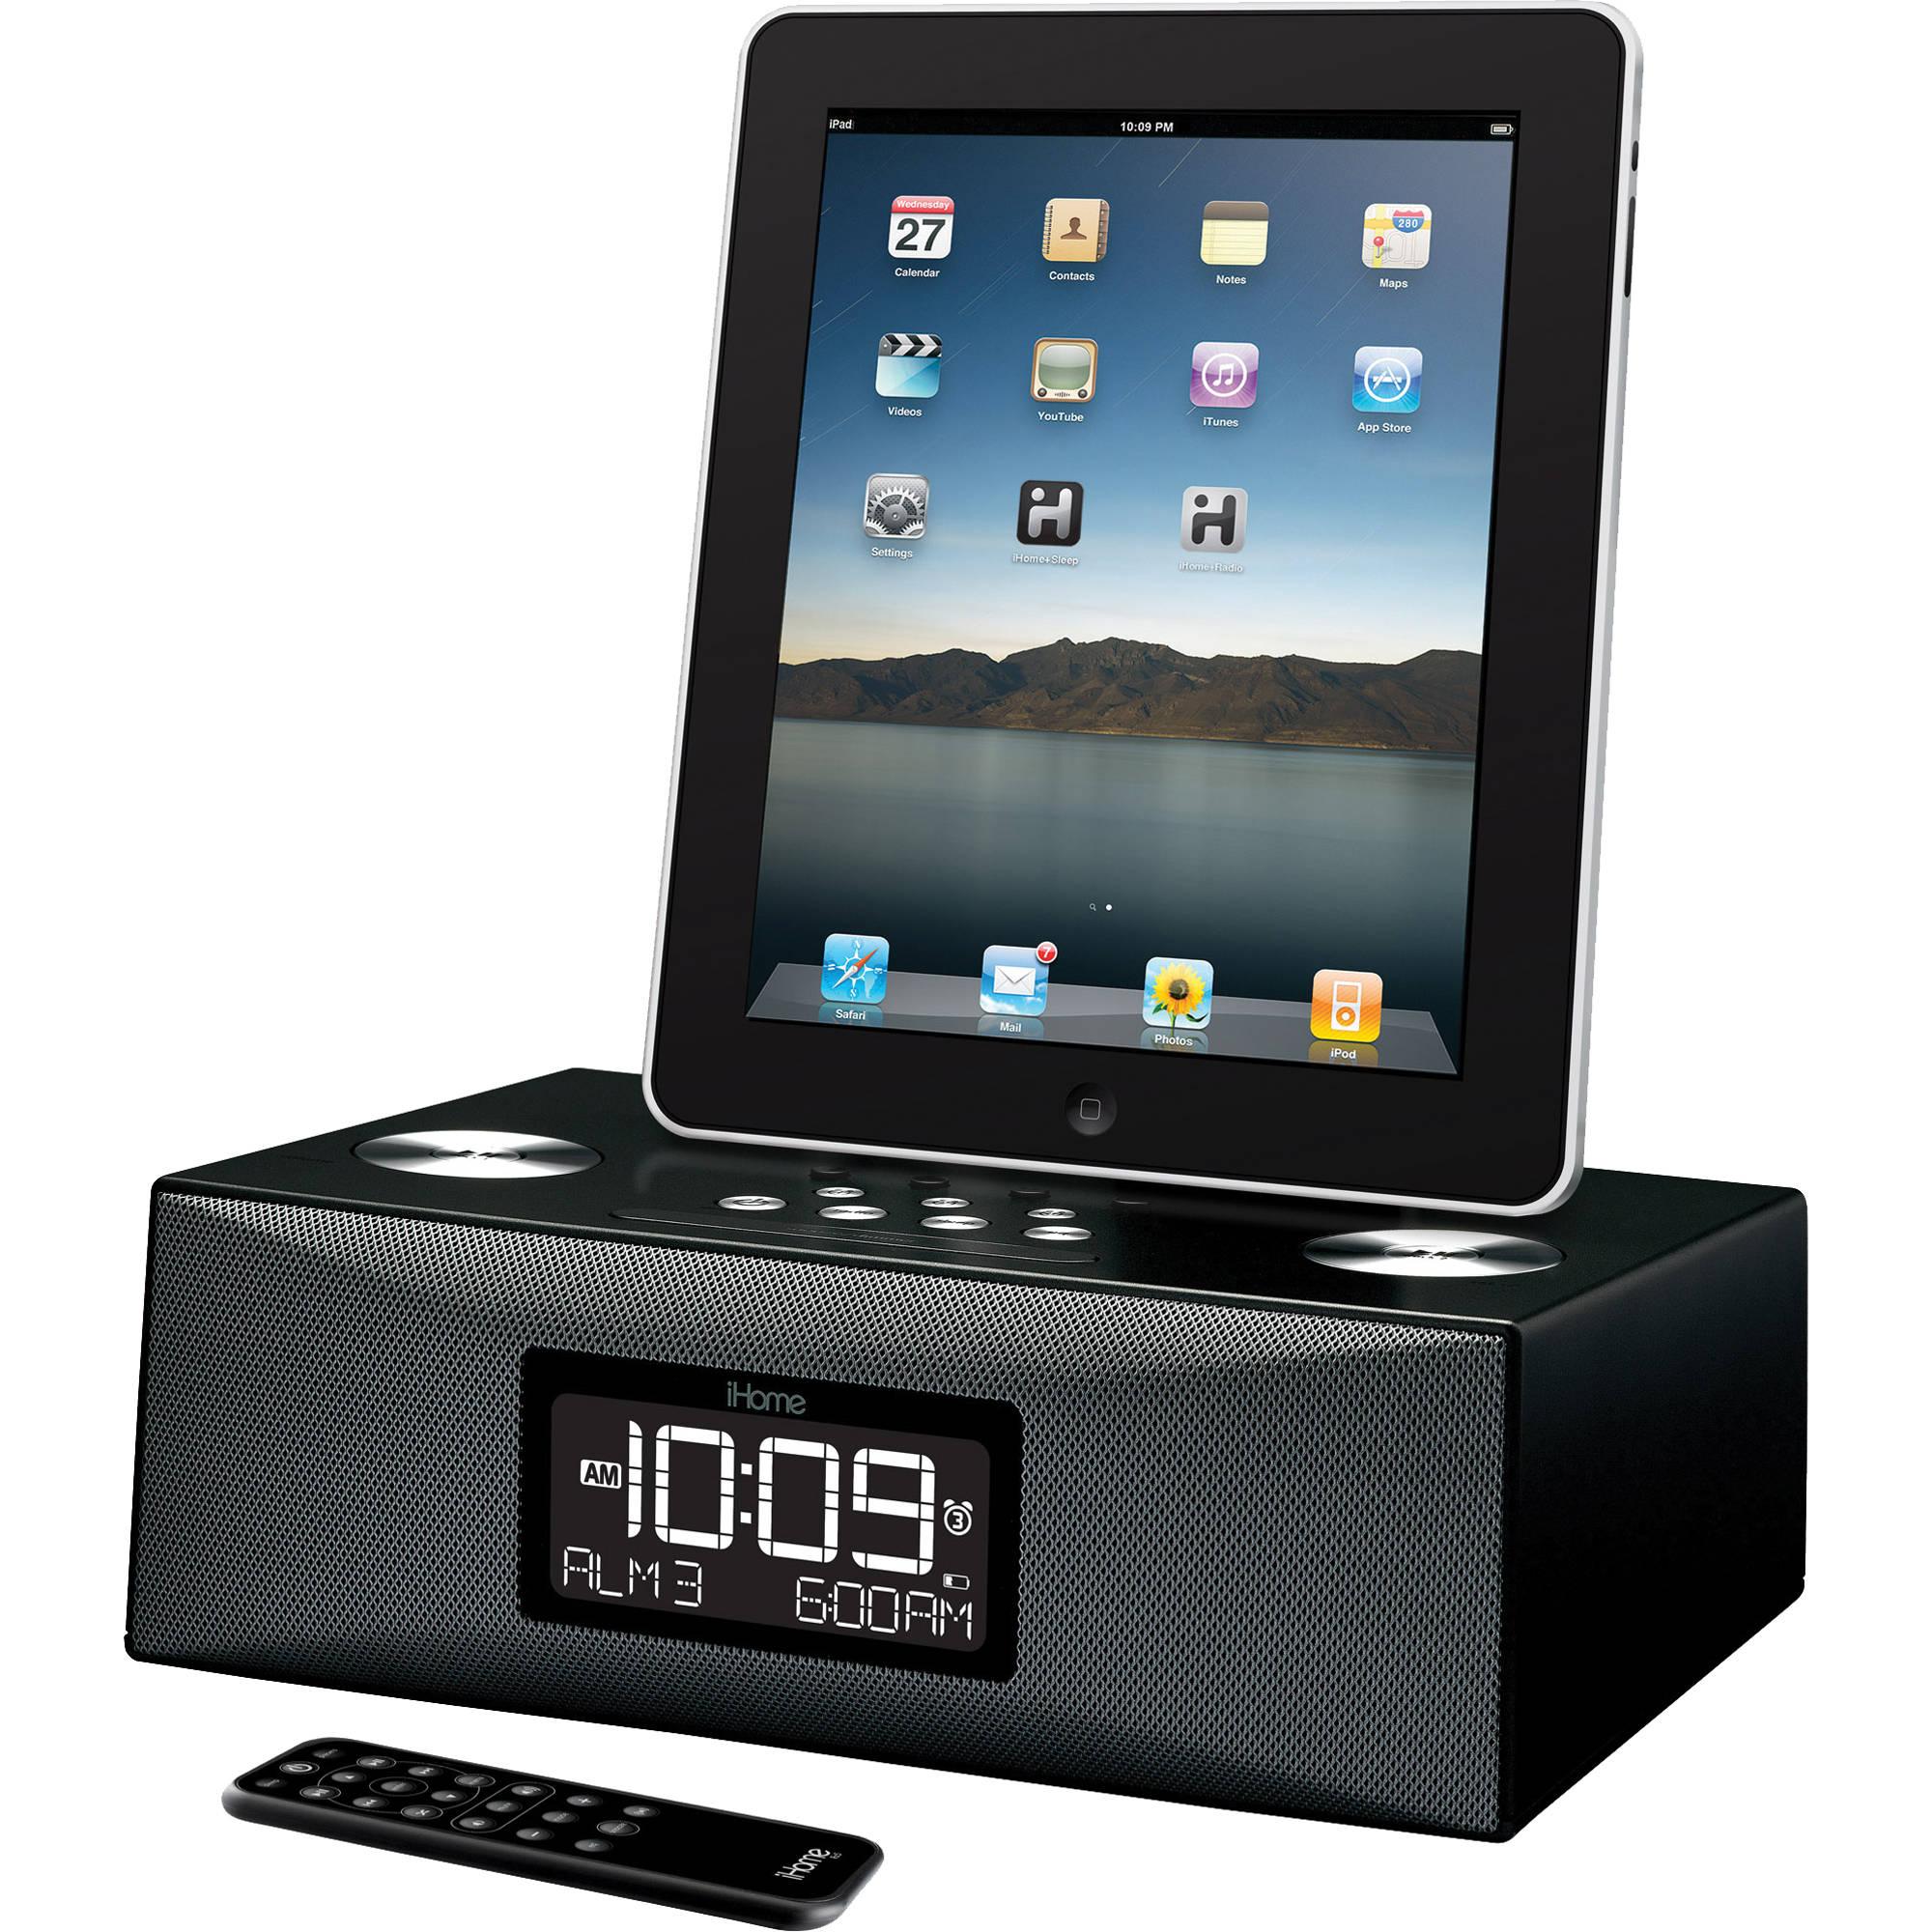 Ihome Clock Radio Adapter For Iphone